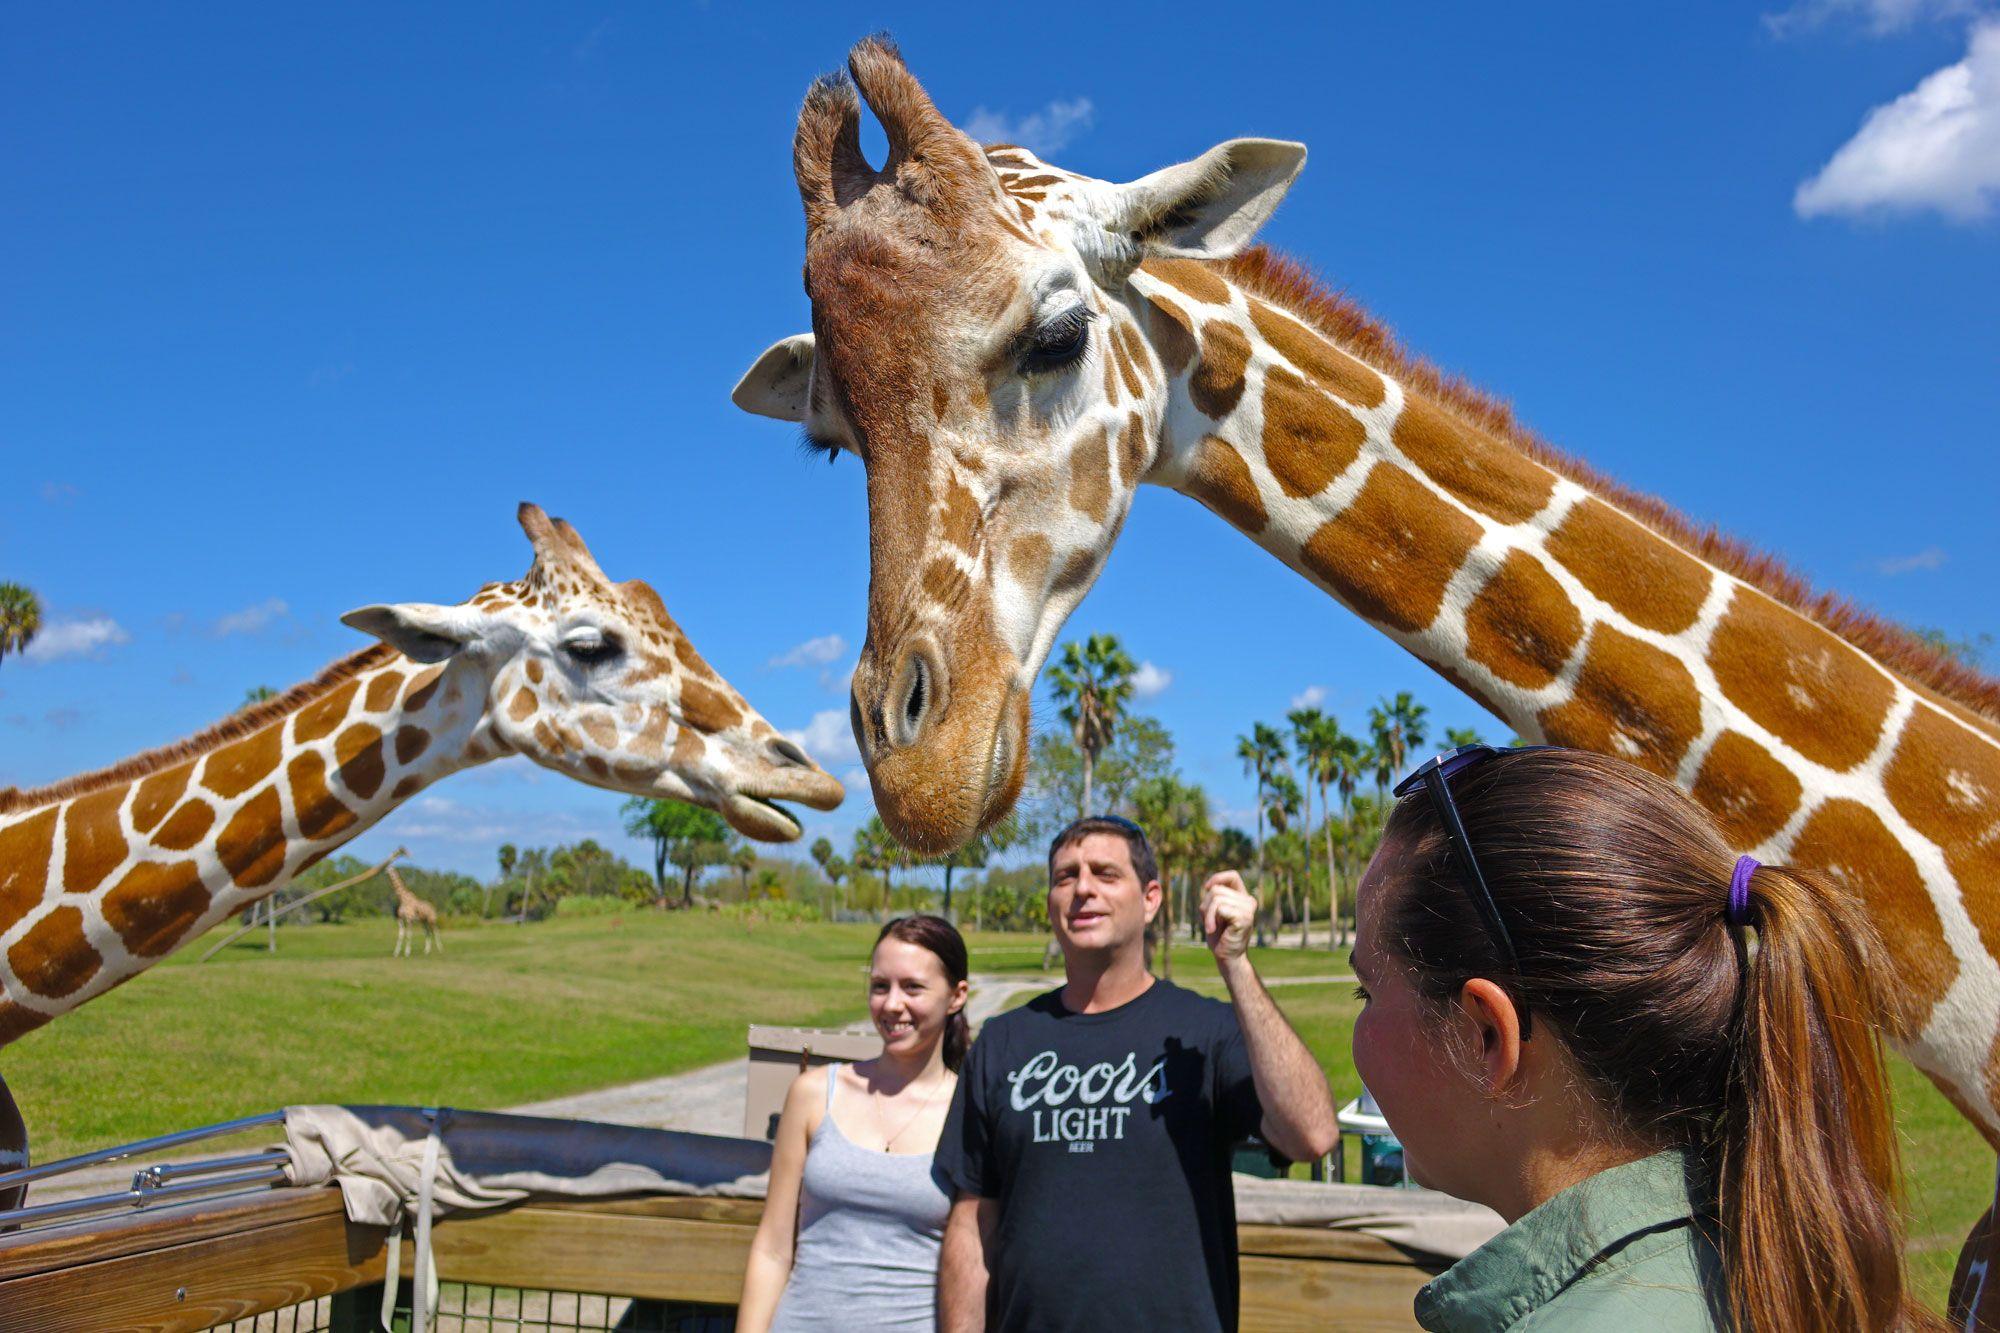 f18d25d3e43b16b194fd05370bcd7299 - Is The Safari Included In Busch Gardens